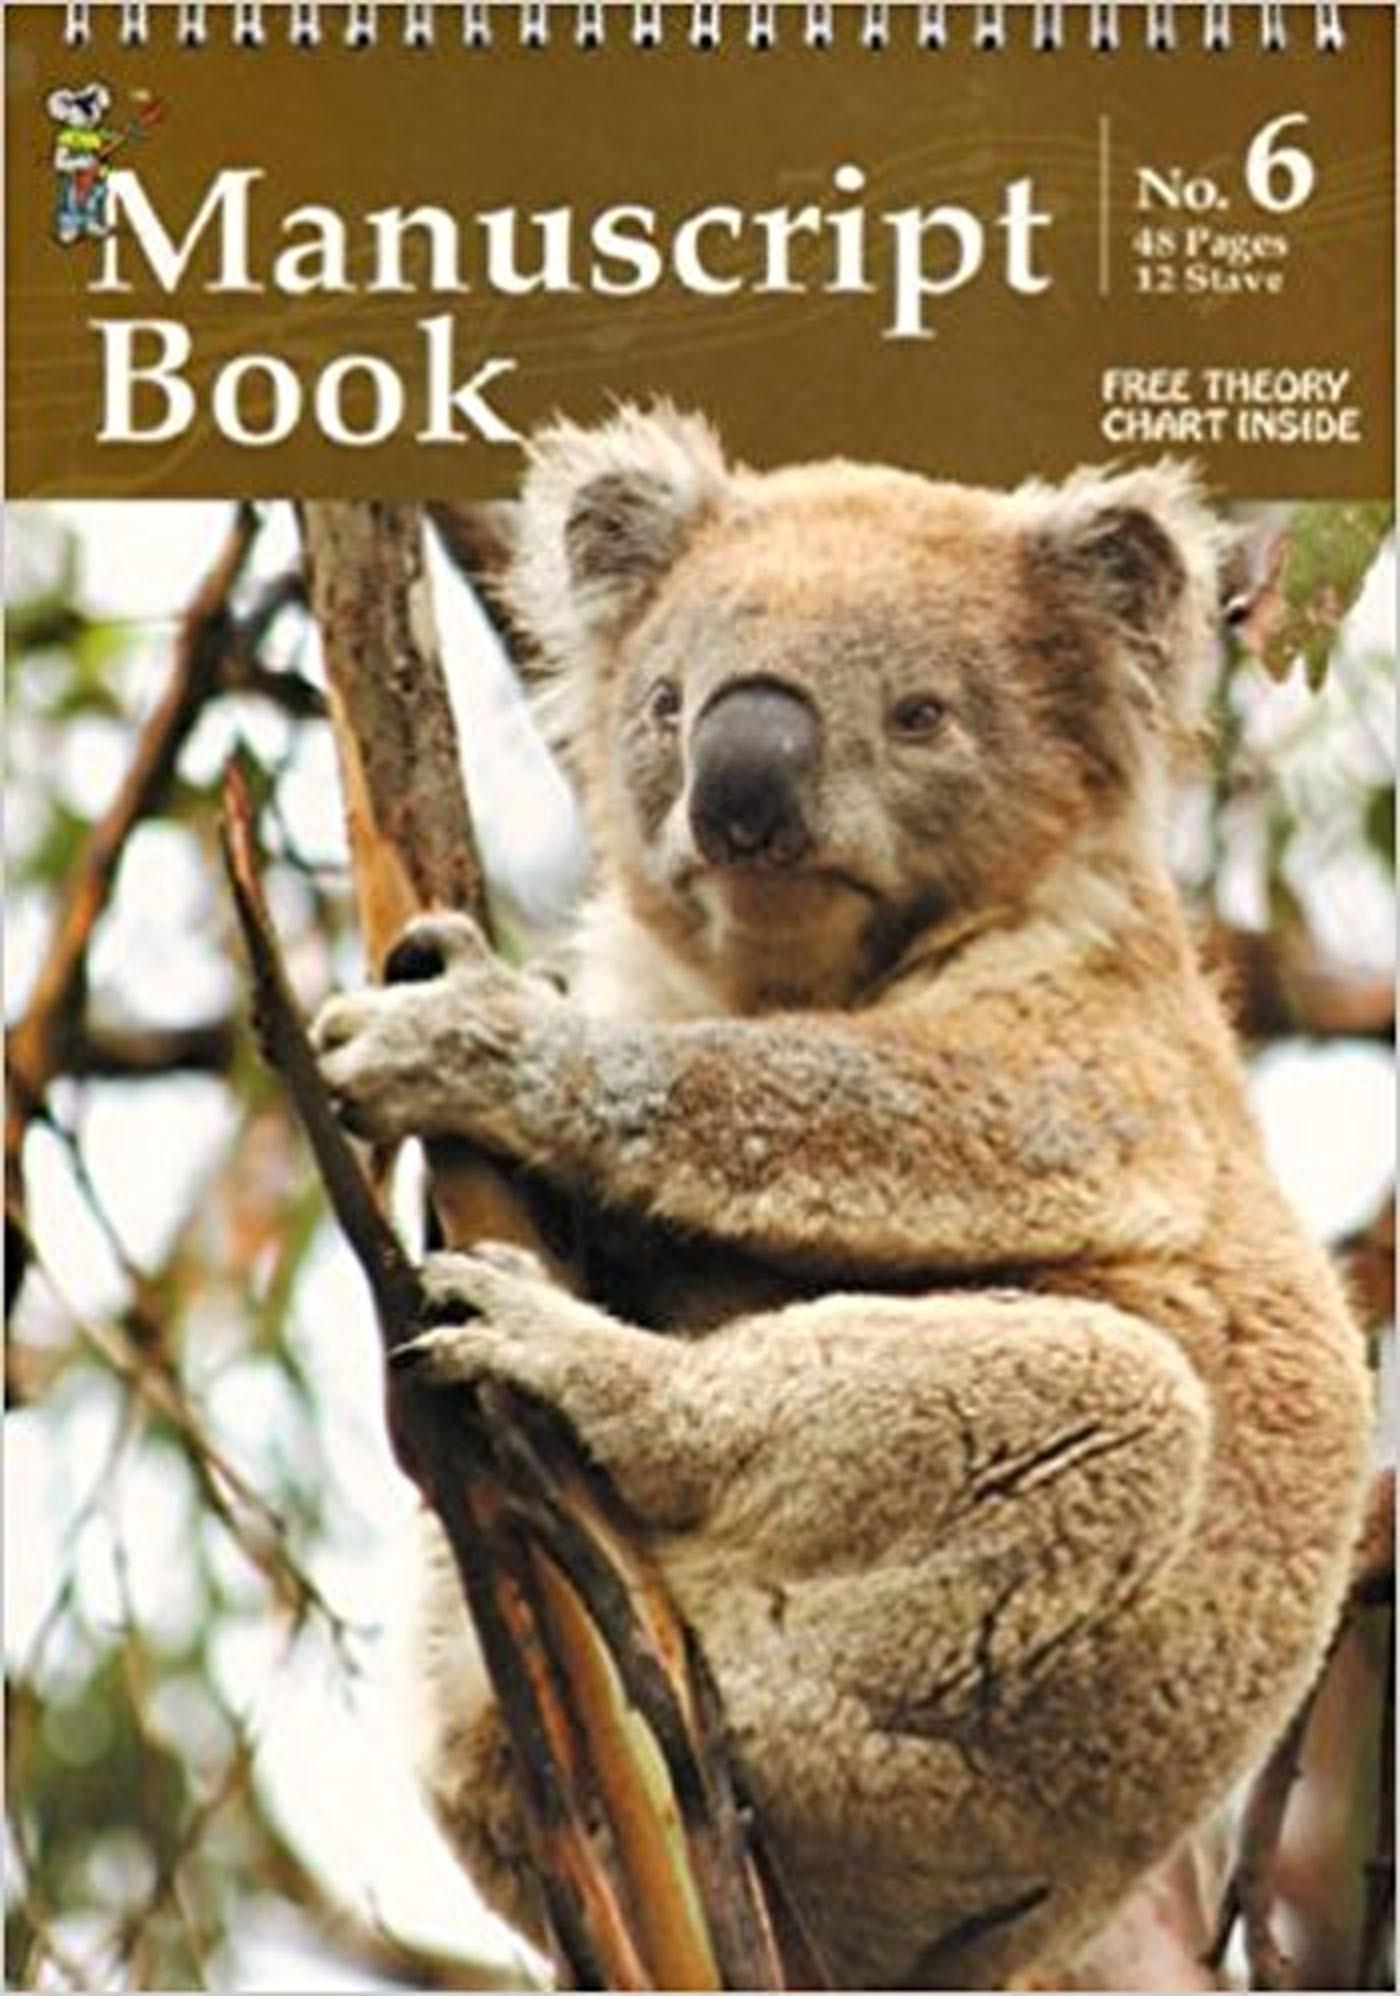 Koala Manuscript No 6 12 Stave 48 Pages Top Spiral Manuscript Paper S94